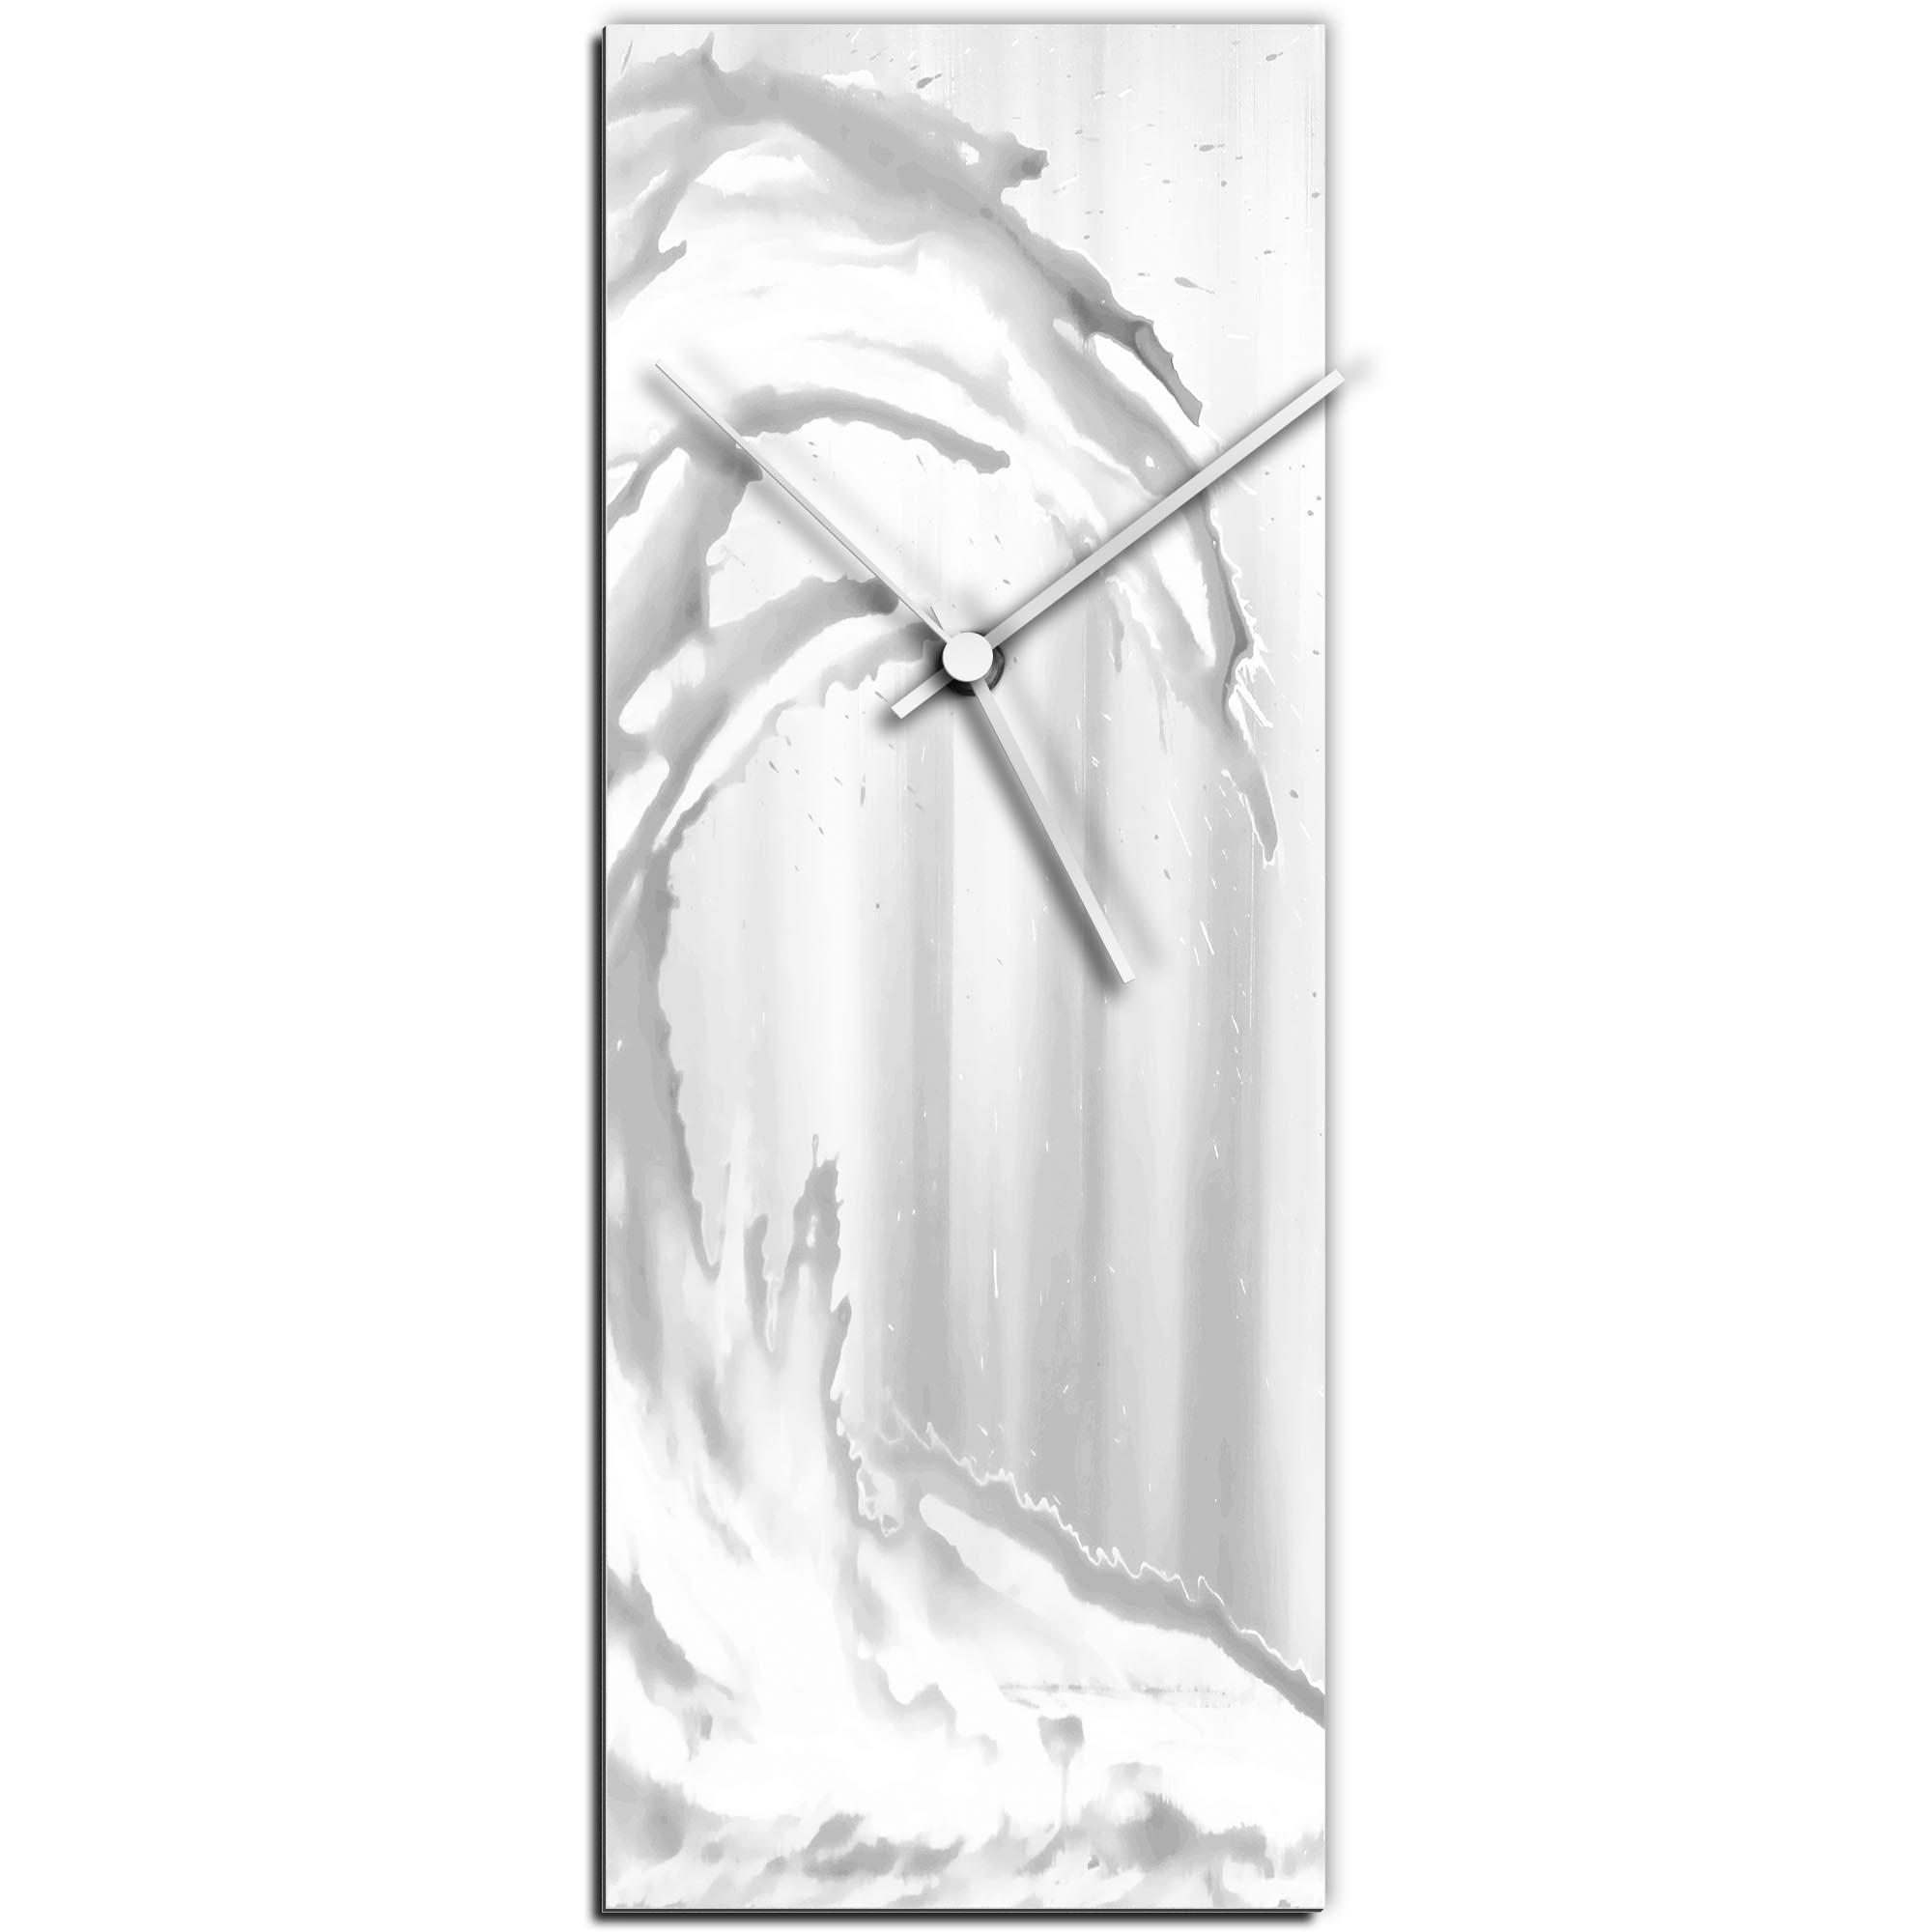 Mendo Vasilevski 'White Wave v1 Clock' 6in x 16in Modern Wall Clock on Aluminum Composite